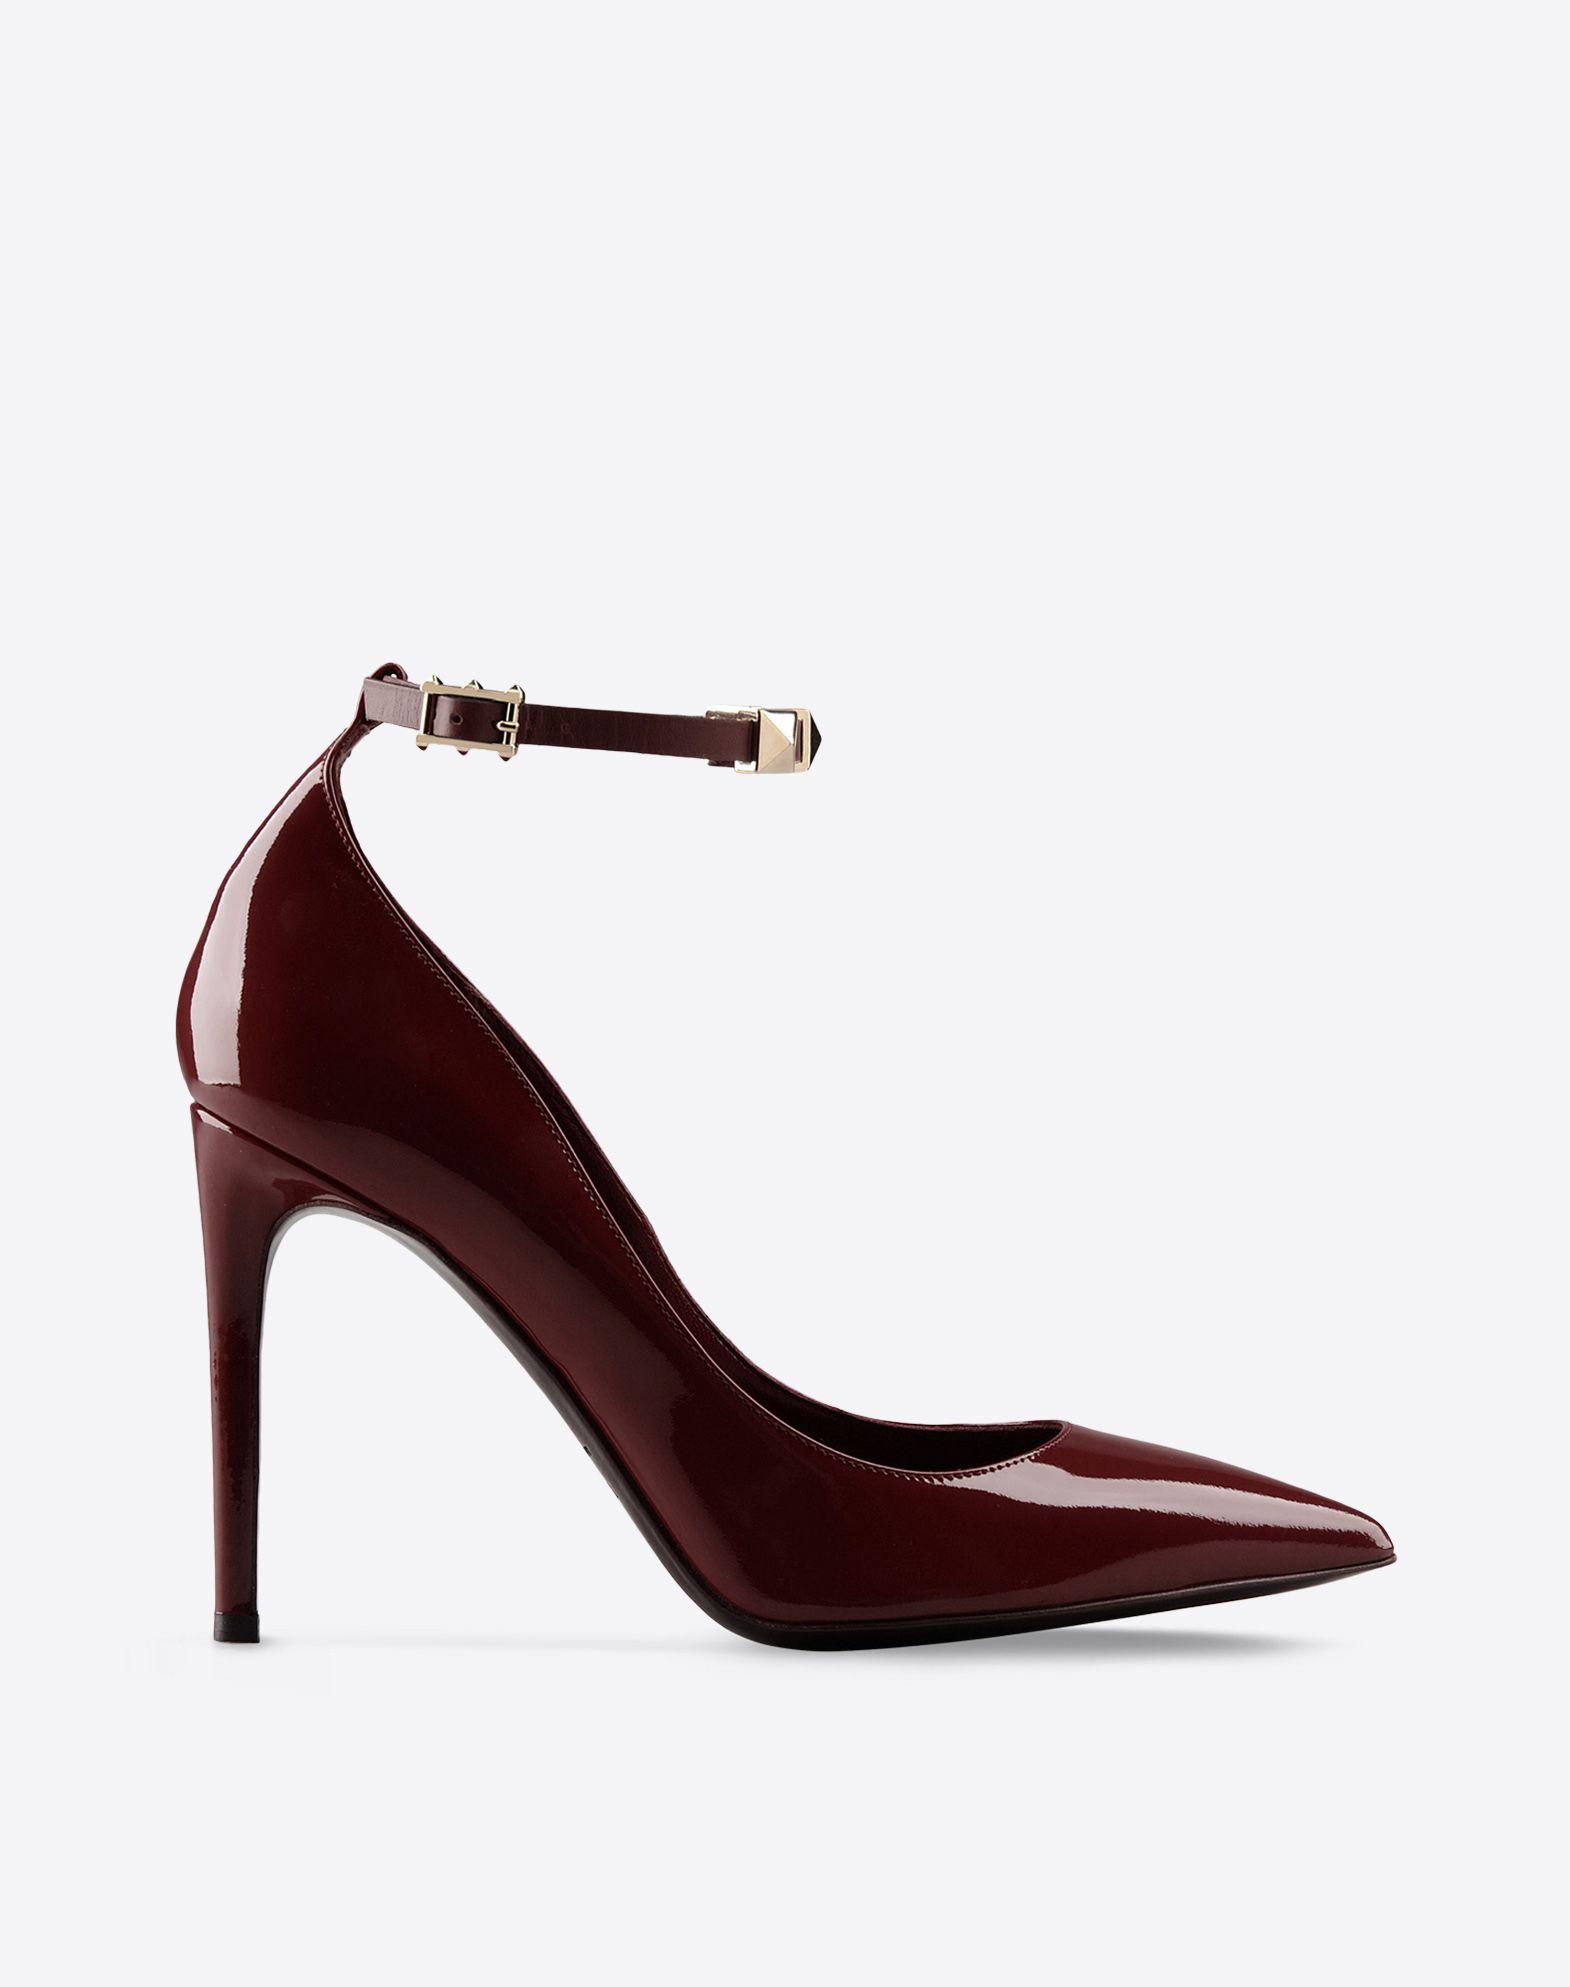 escarpin rubis escarpin femme valentino garavani boutique en ligne valentino. Black Bedroom Furniture Sets. Home Design Ideas